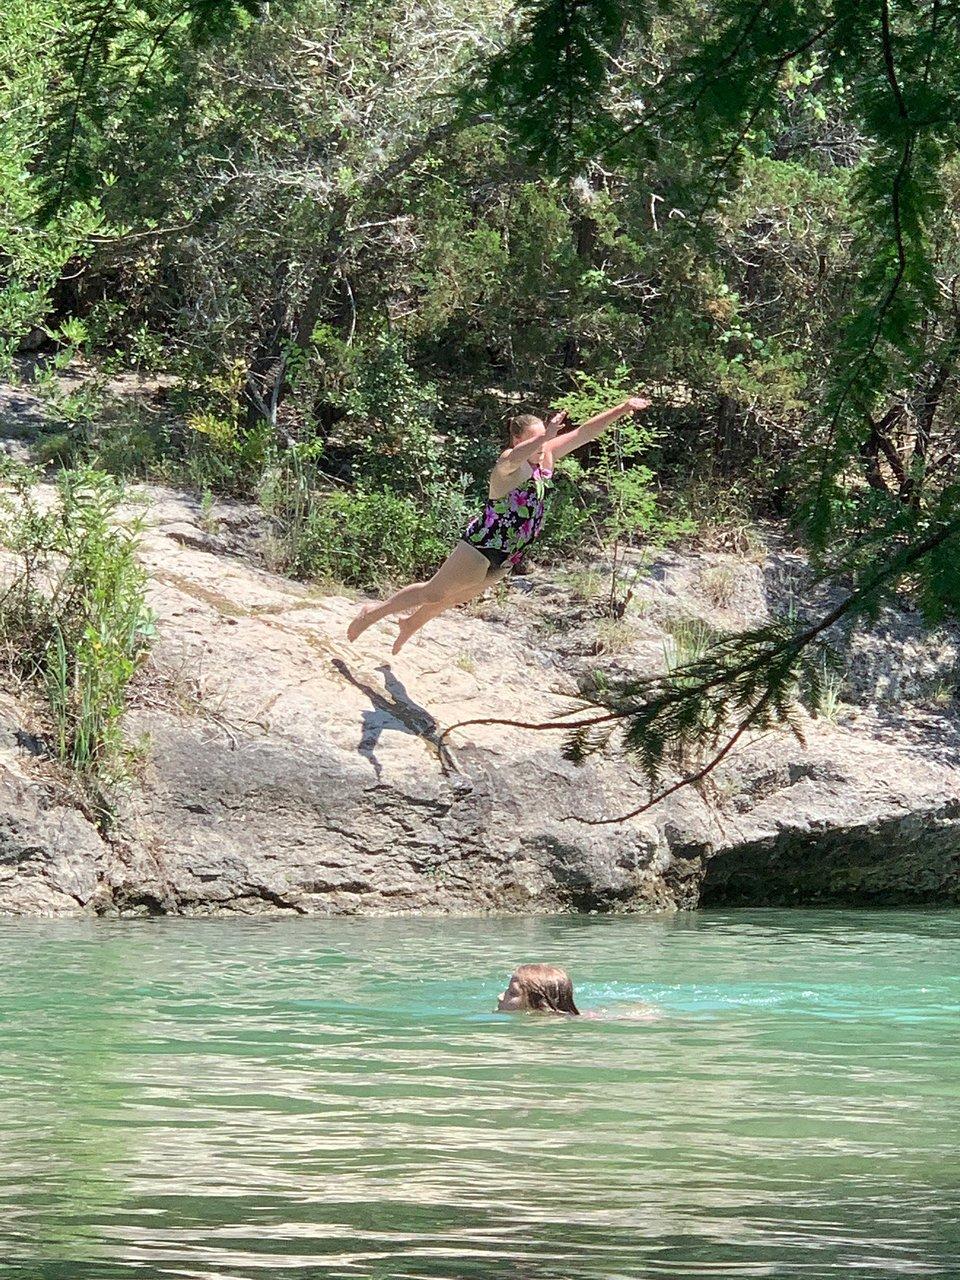 paradise canyon updated 2019 campground reviews rio medina tx rh tripadvisor com